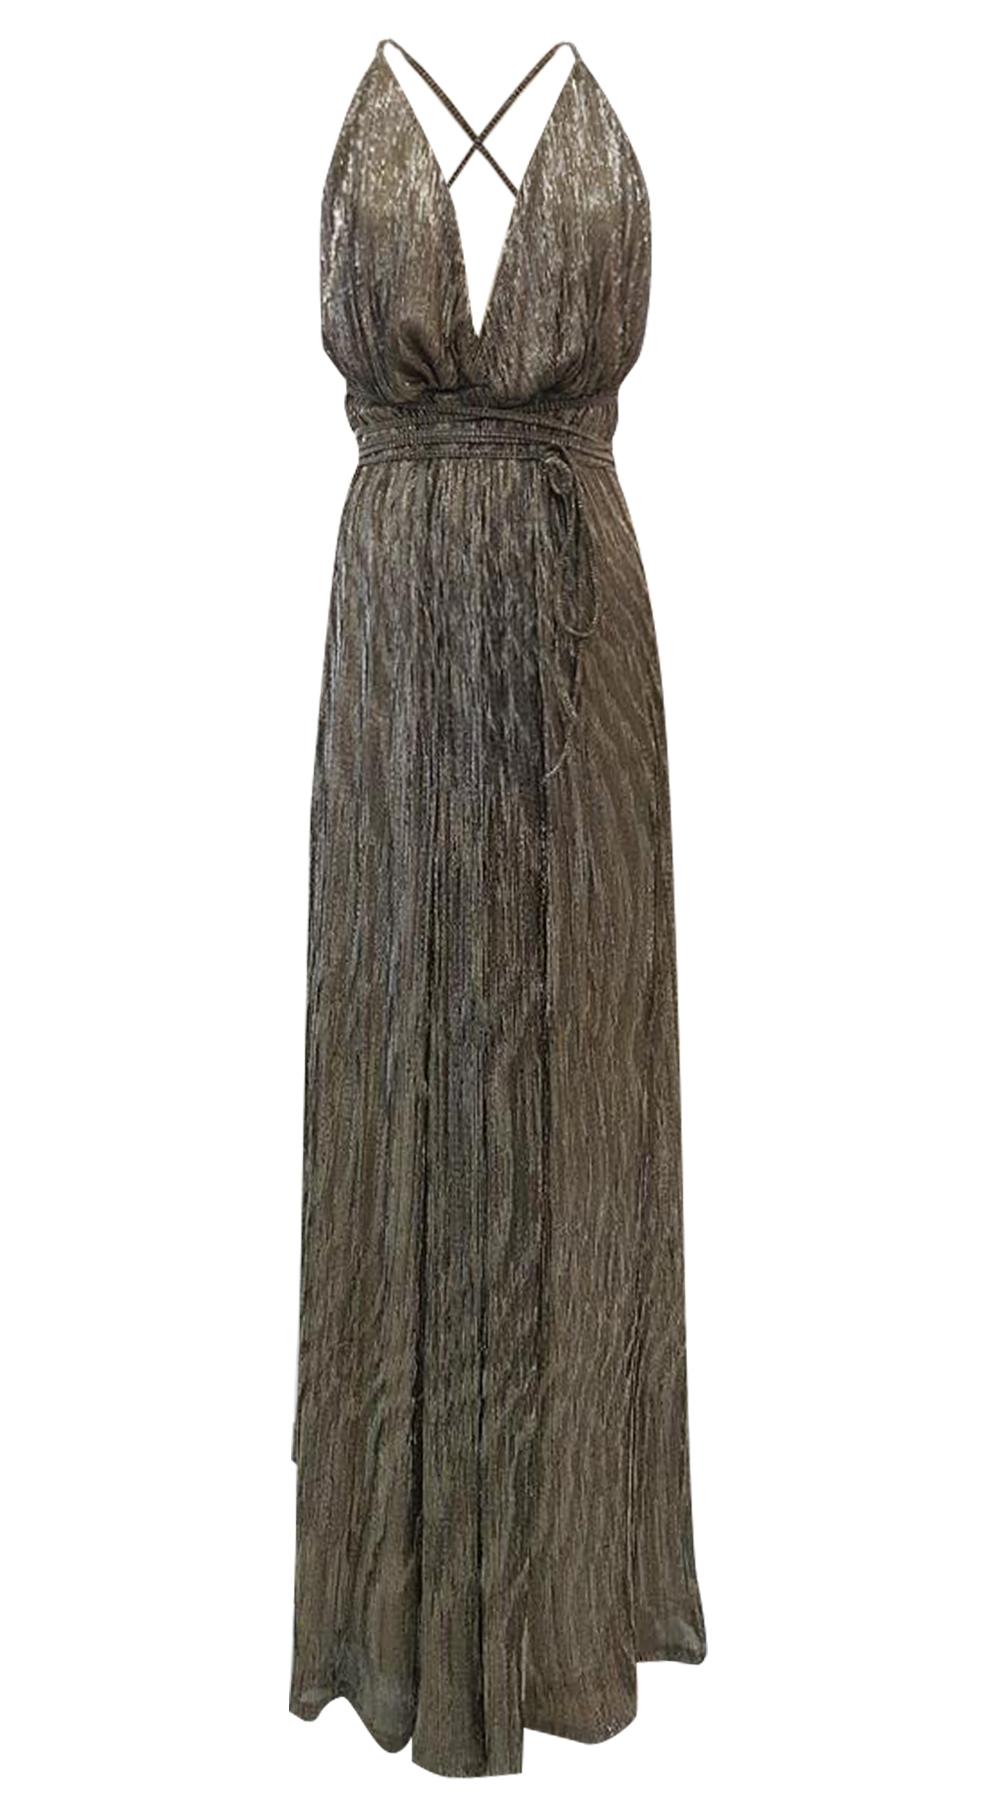 a9604046dcf6 Μάξι χρυσό φόρεμα με χιαστί πλάτη Online